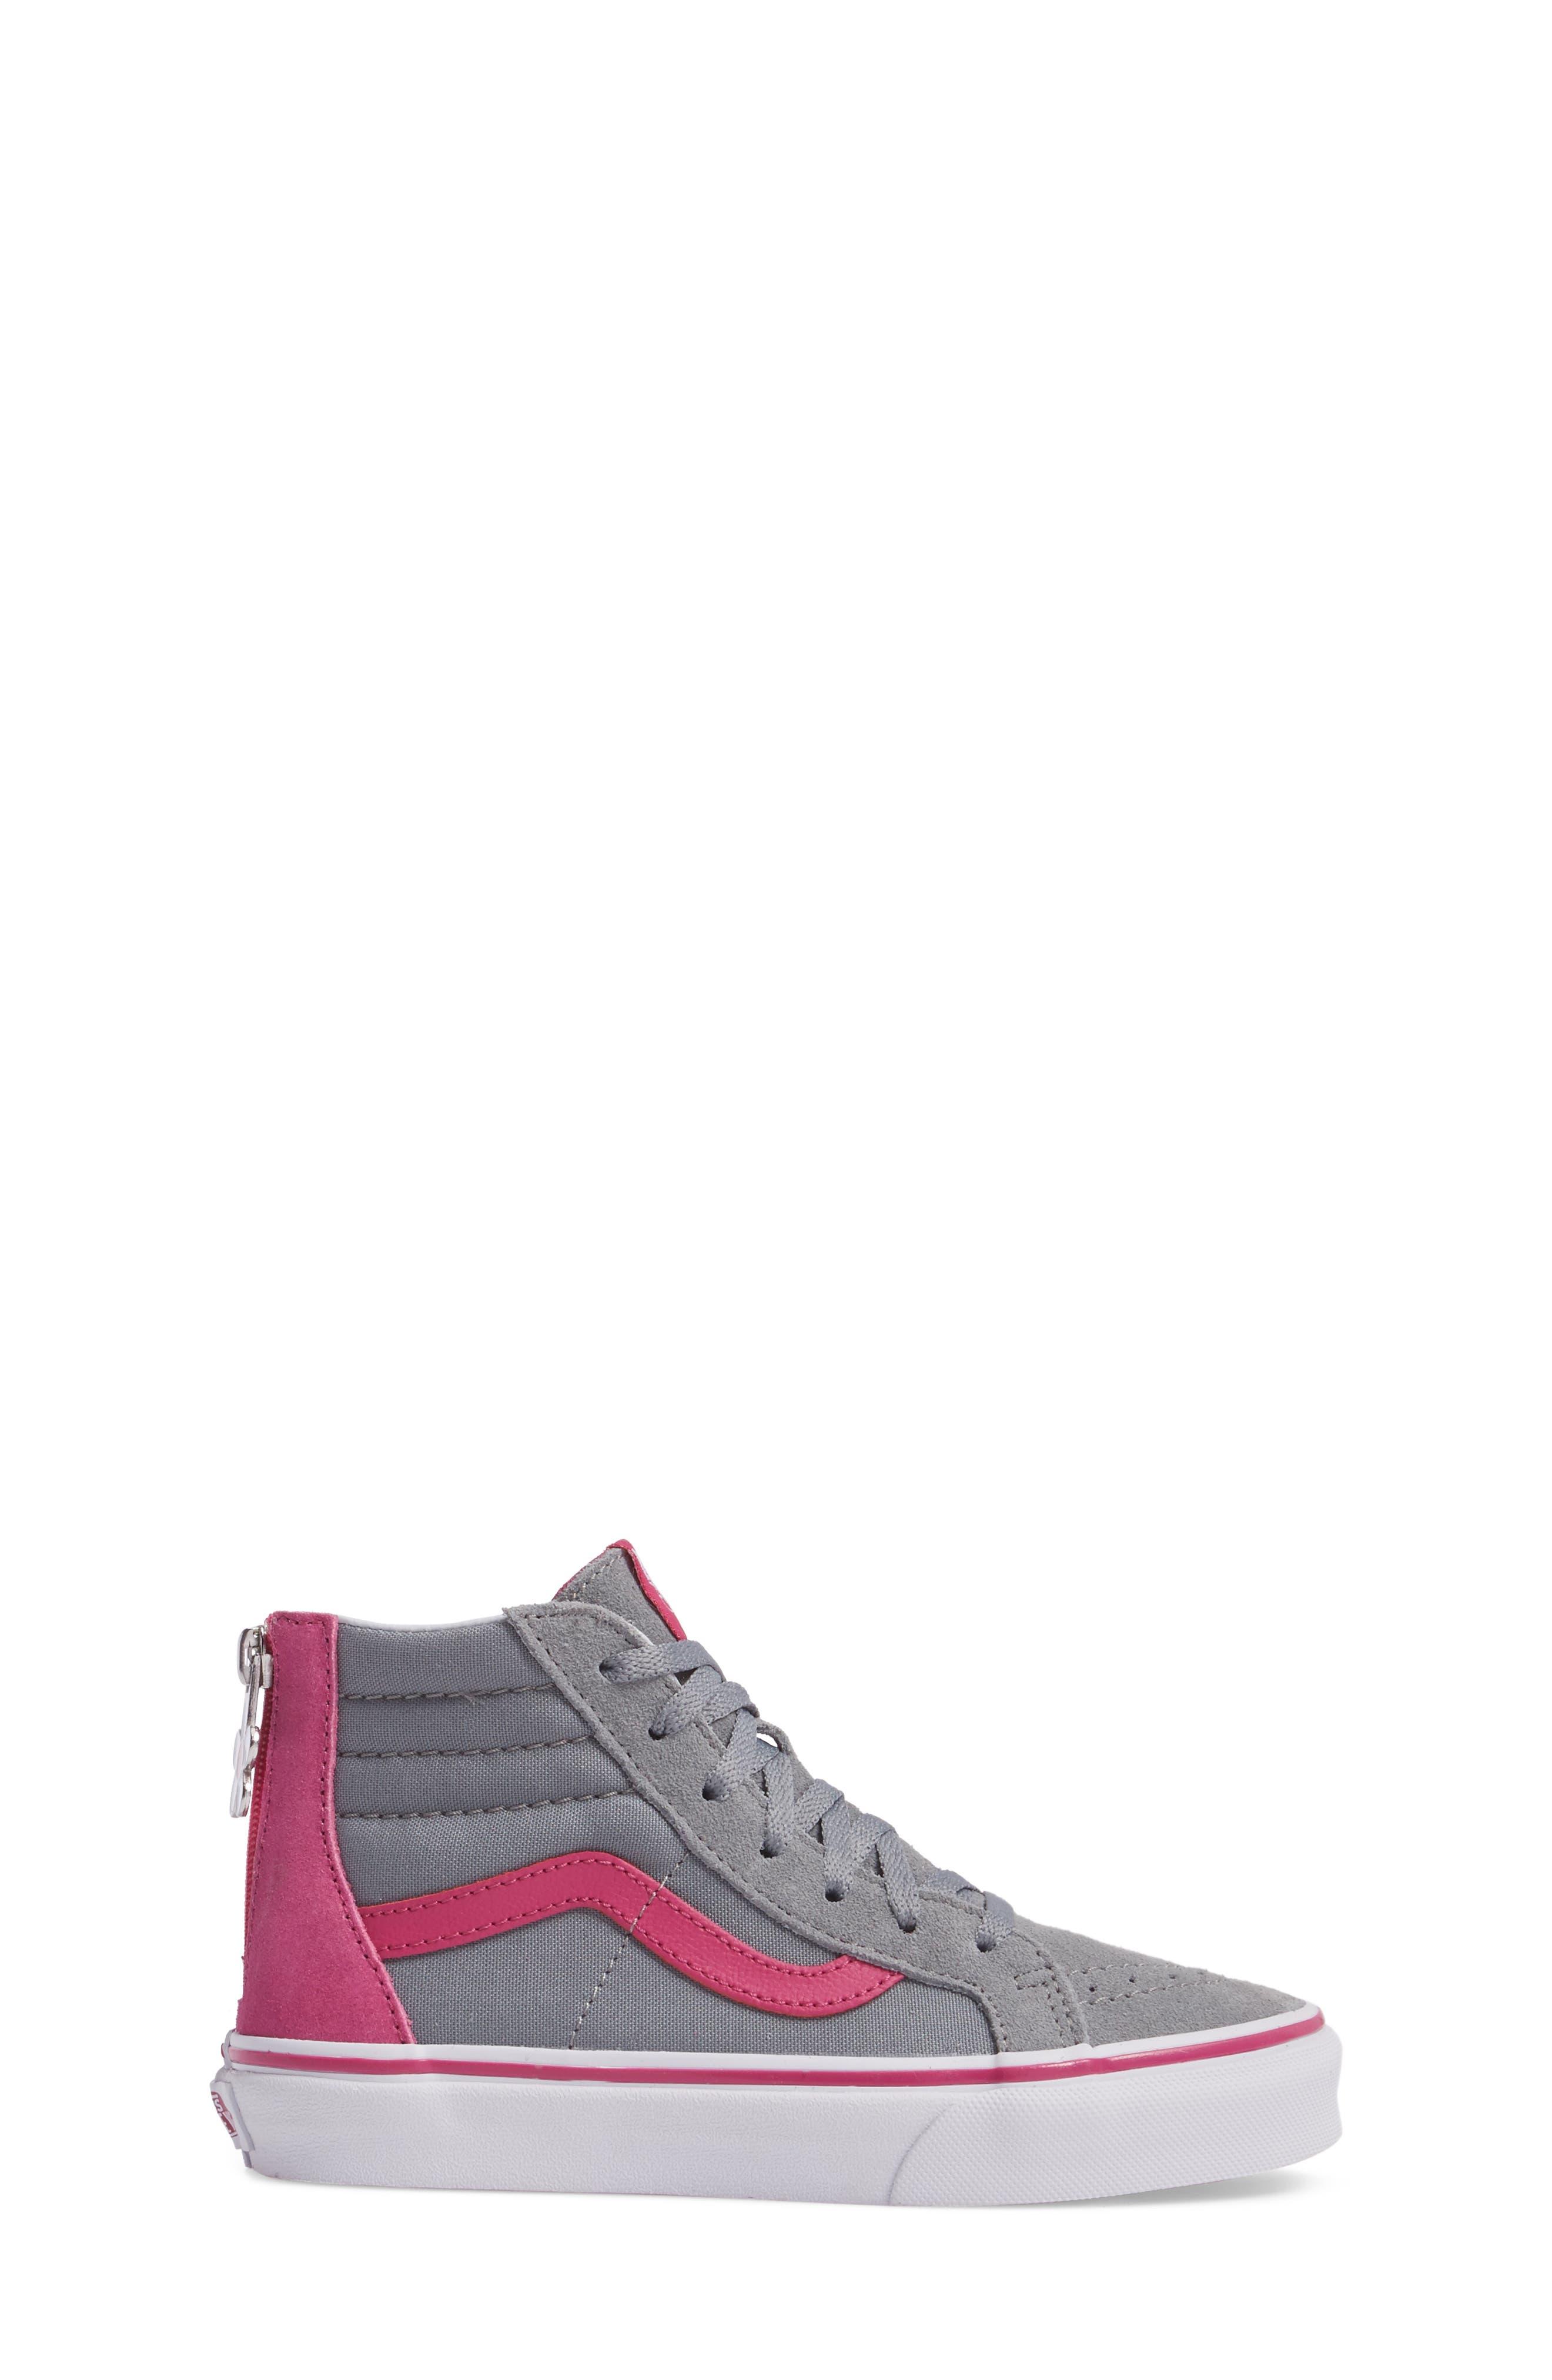 Alternate Image 3  - Vans SK8-Hi Zip-Up Sneaker (Toddler, Little Kid & Big Kid)